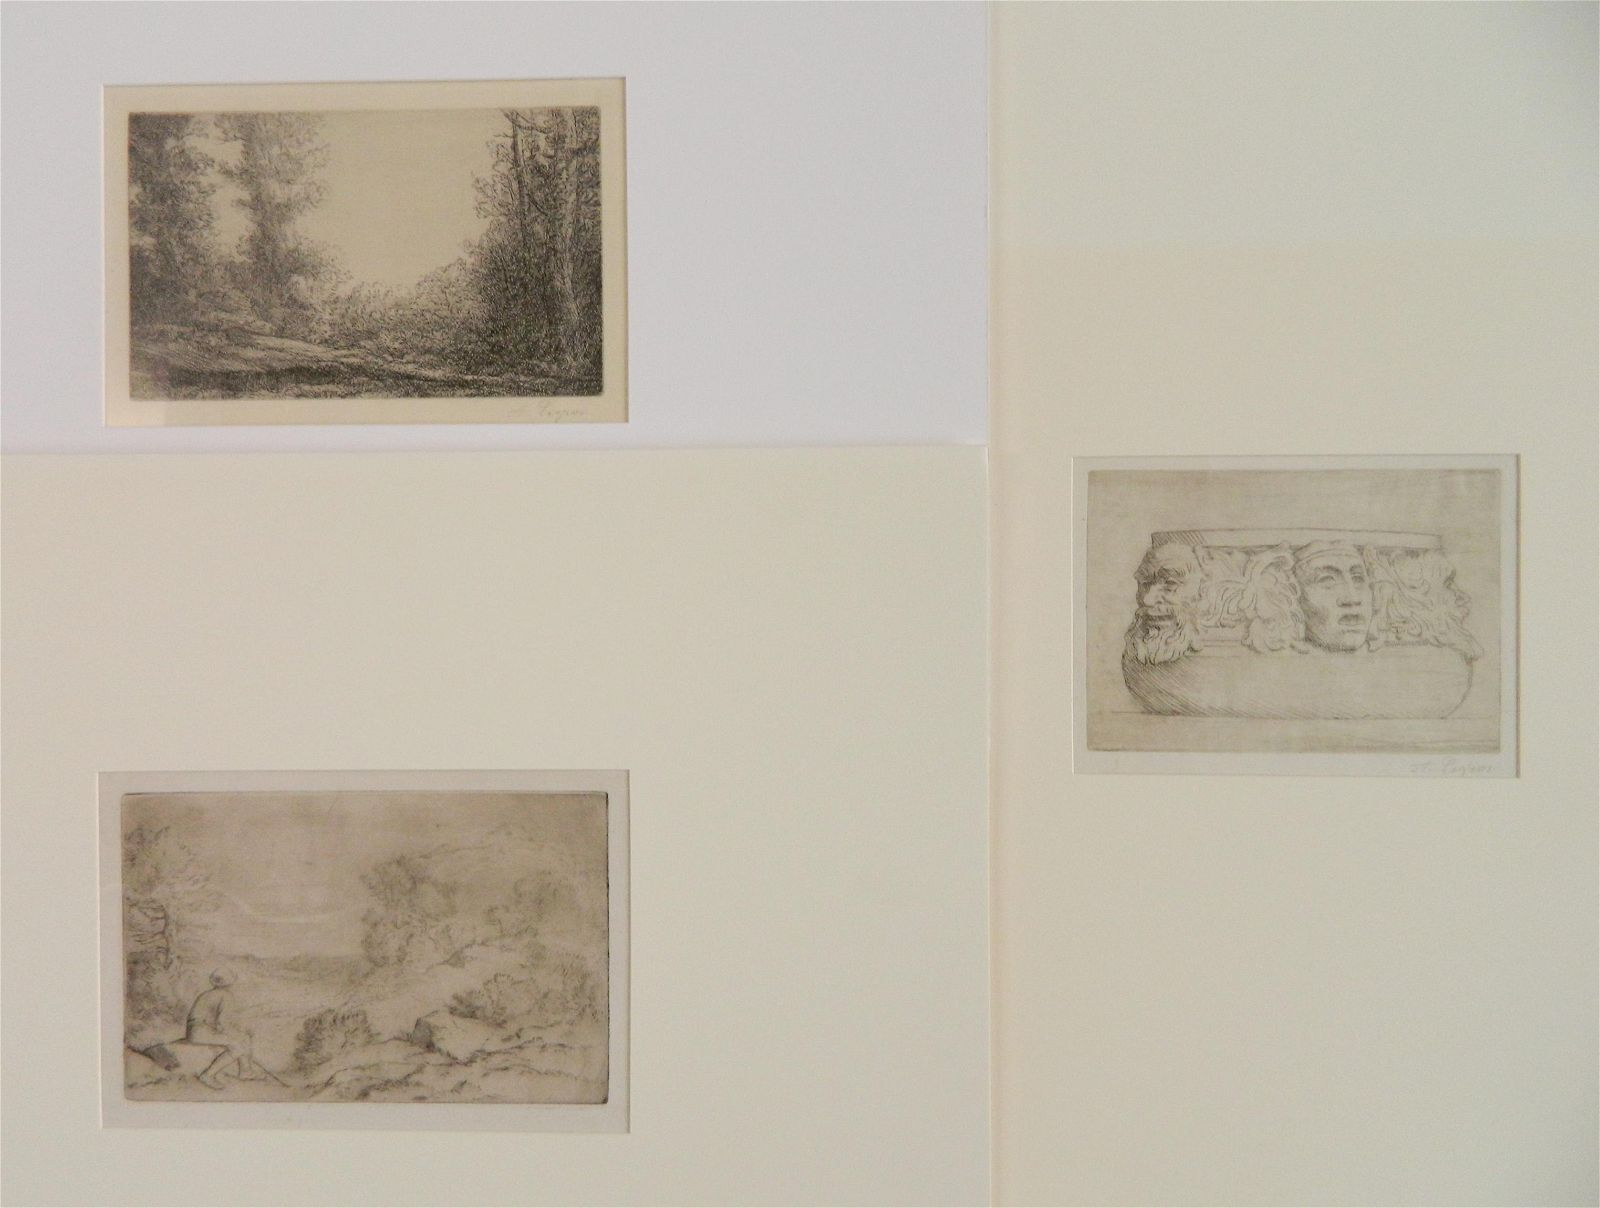 3 Alphonse Legros etchings